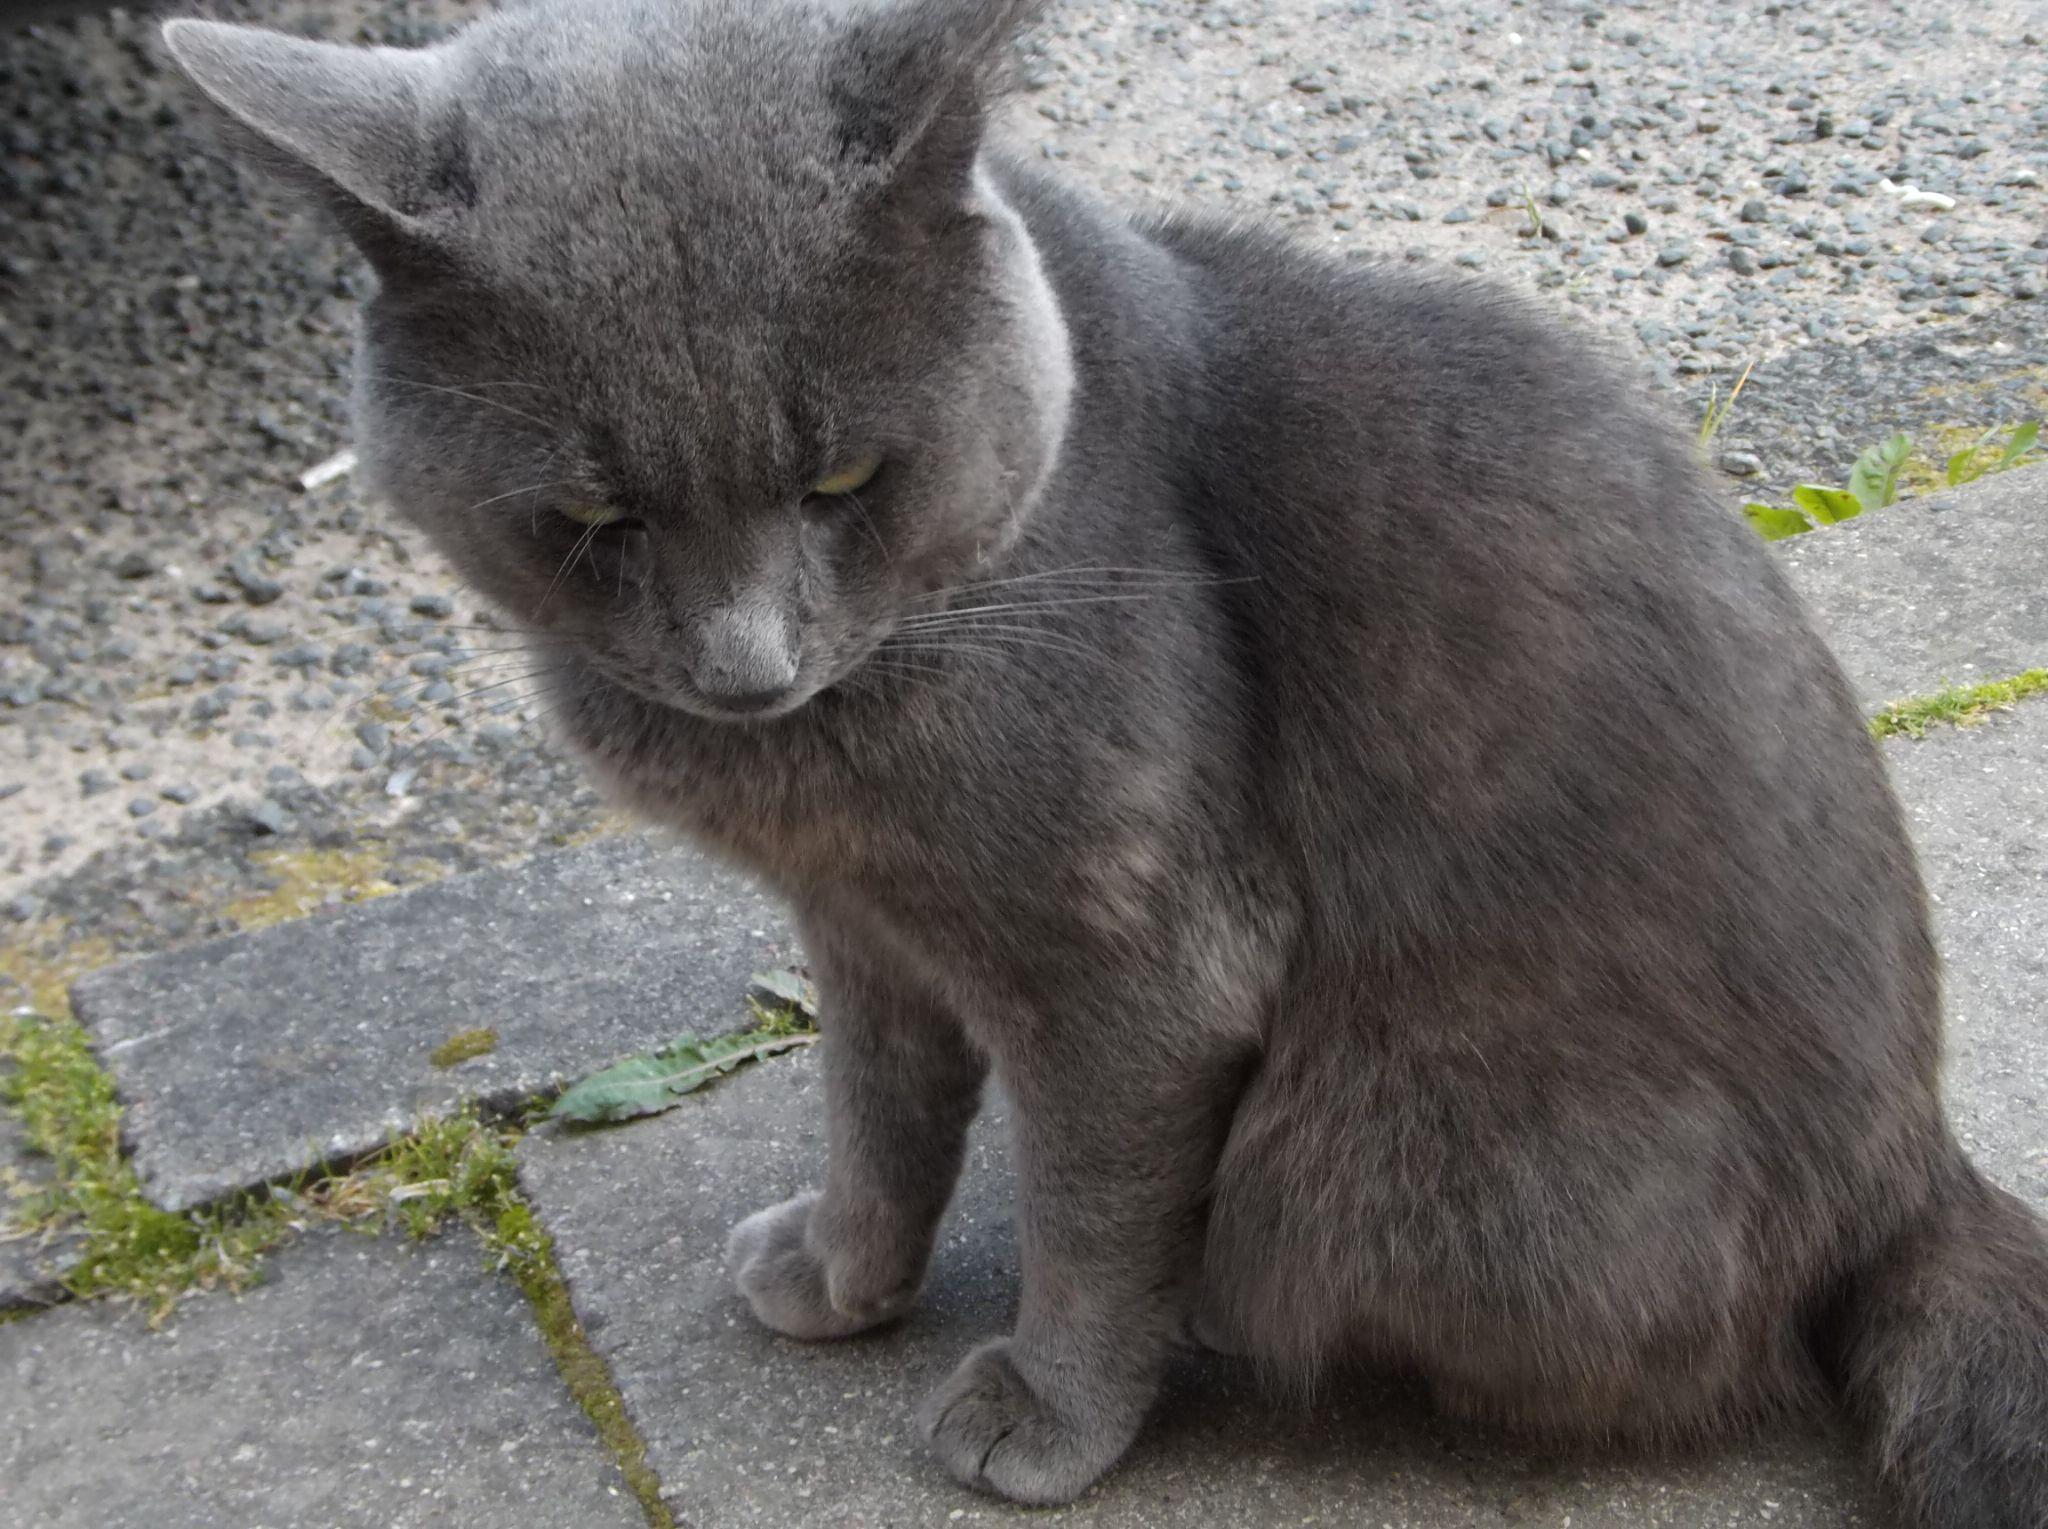 Yard Cat-3 by Zita Užkuraitienė